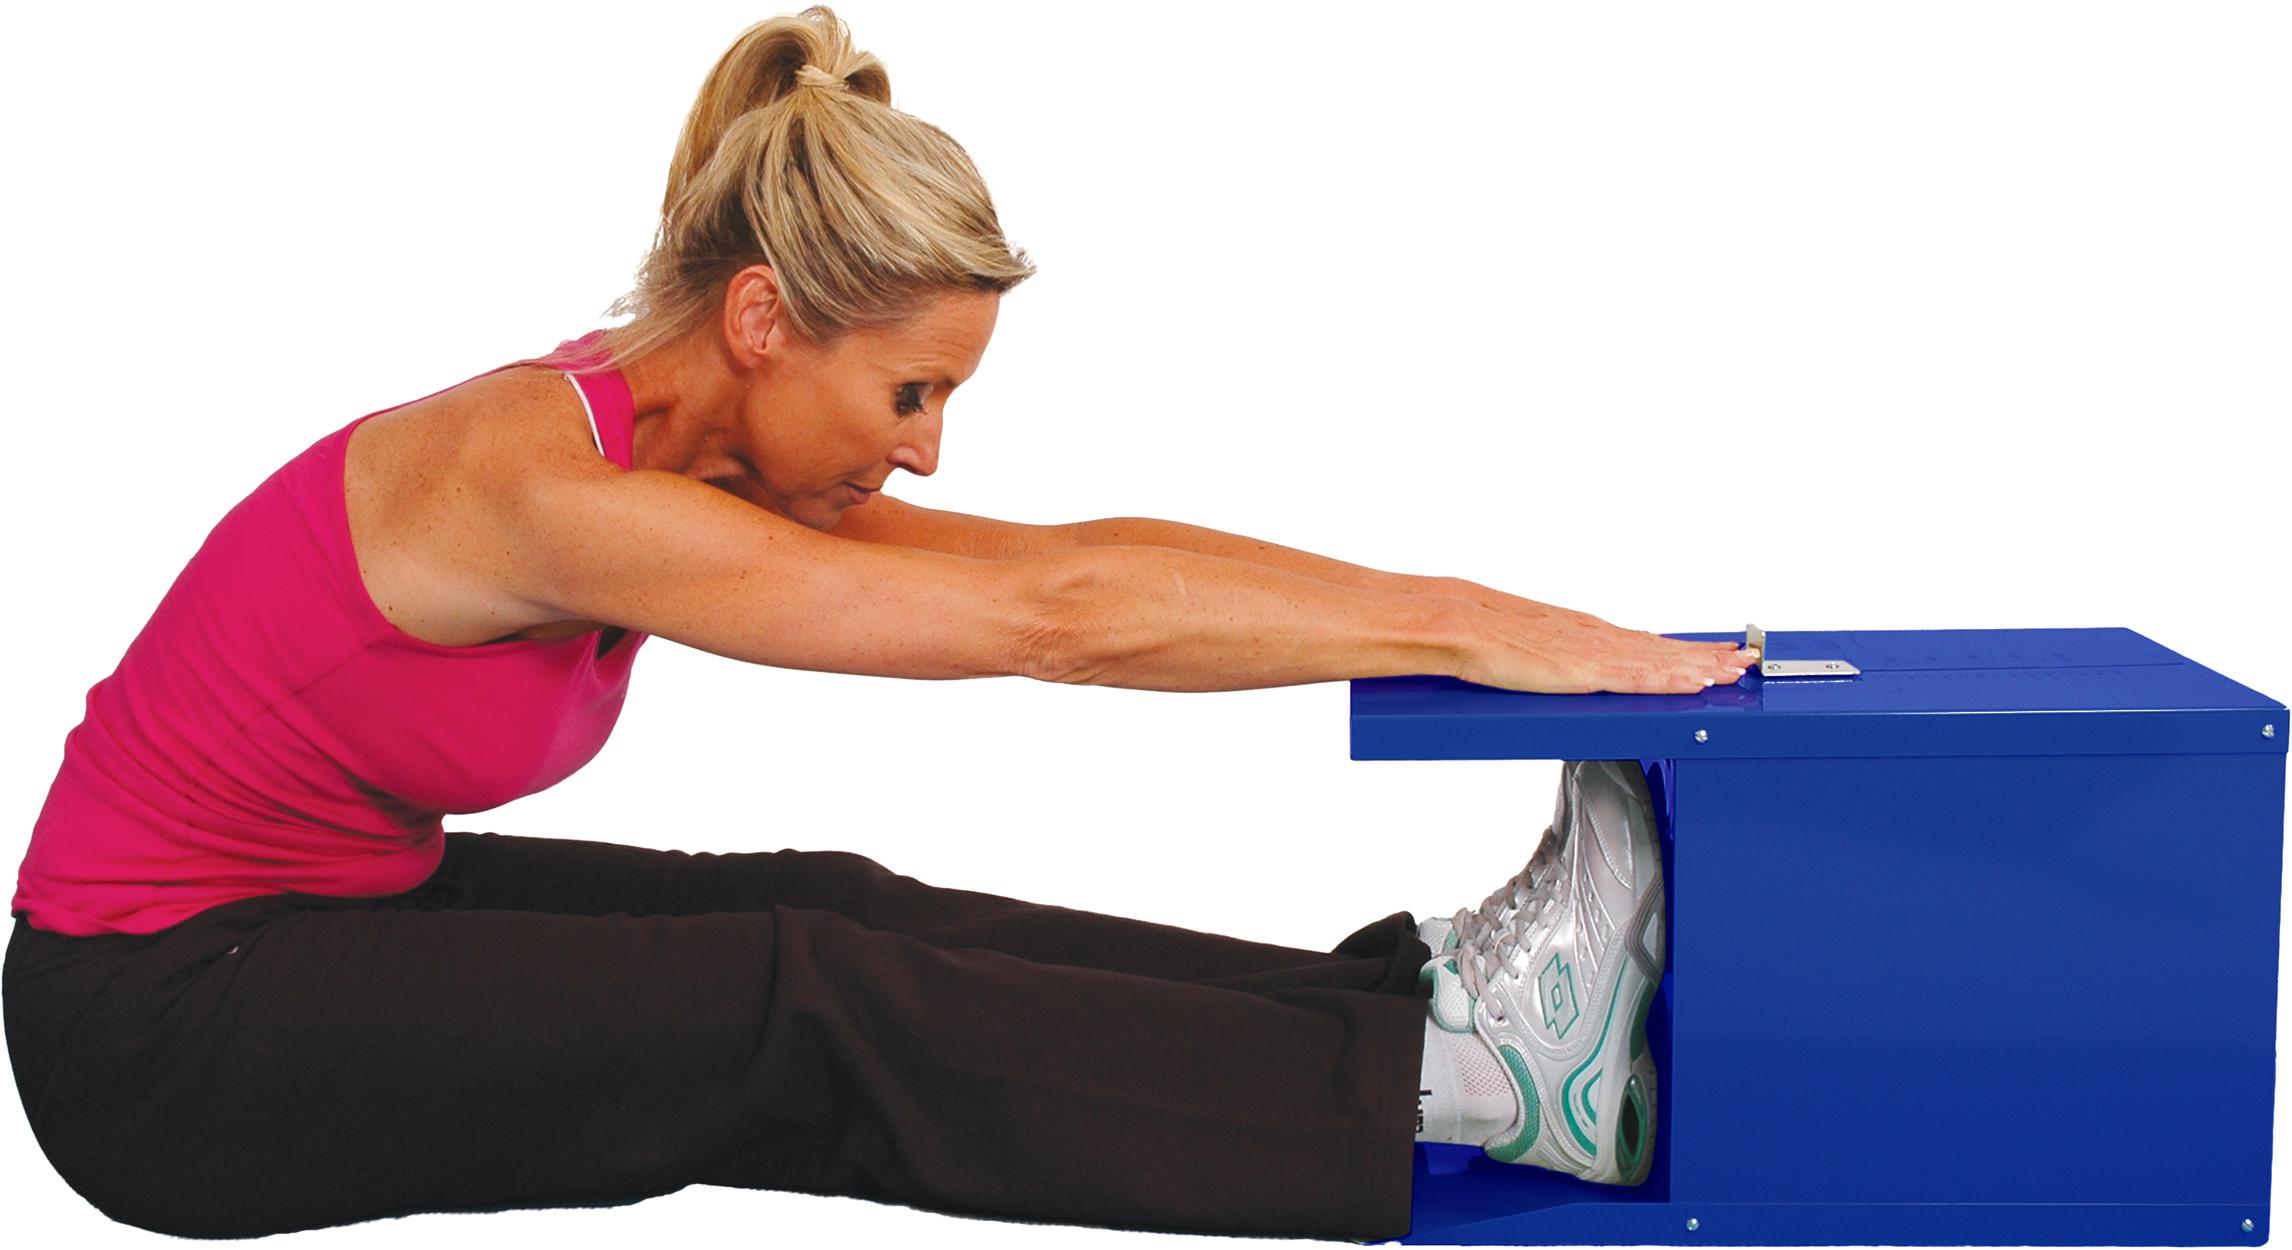 08-060103 - Sit & Reach Unit Blue - MVS In Motion | Health ...